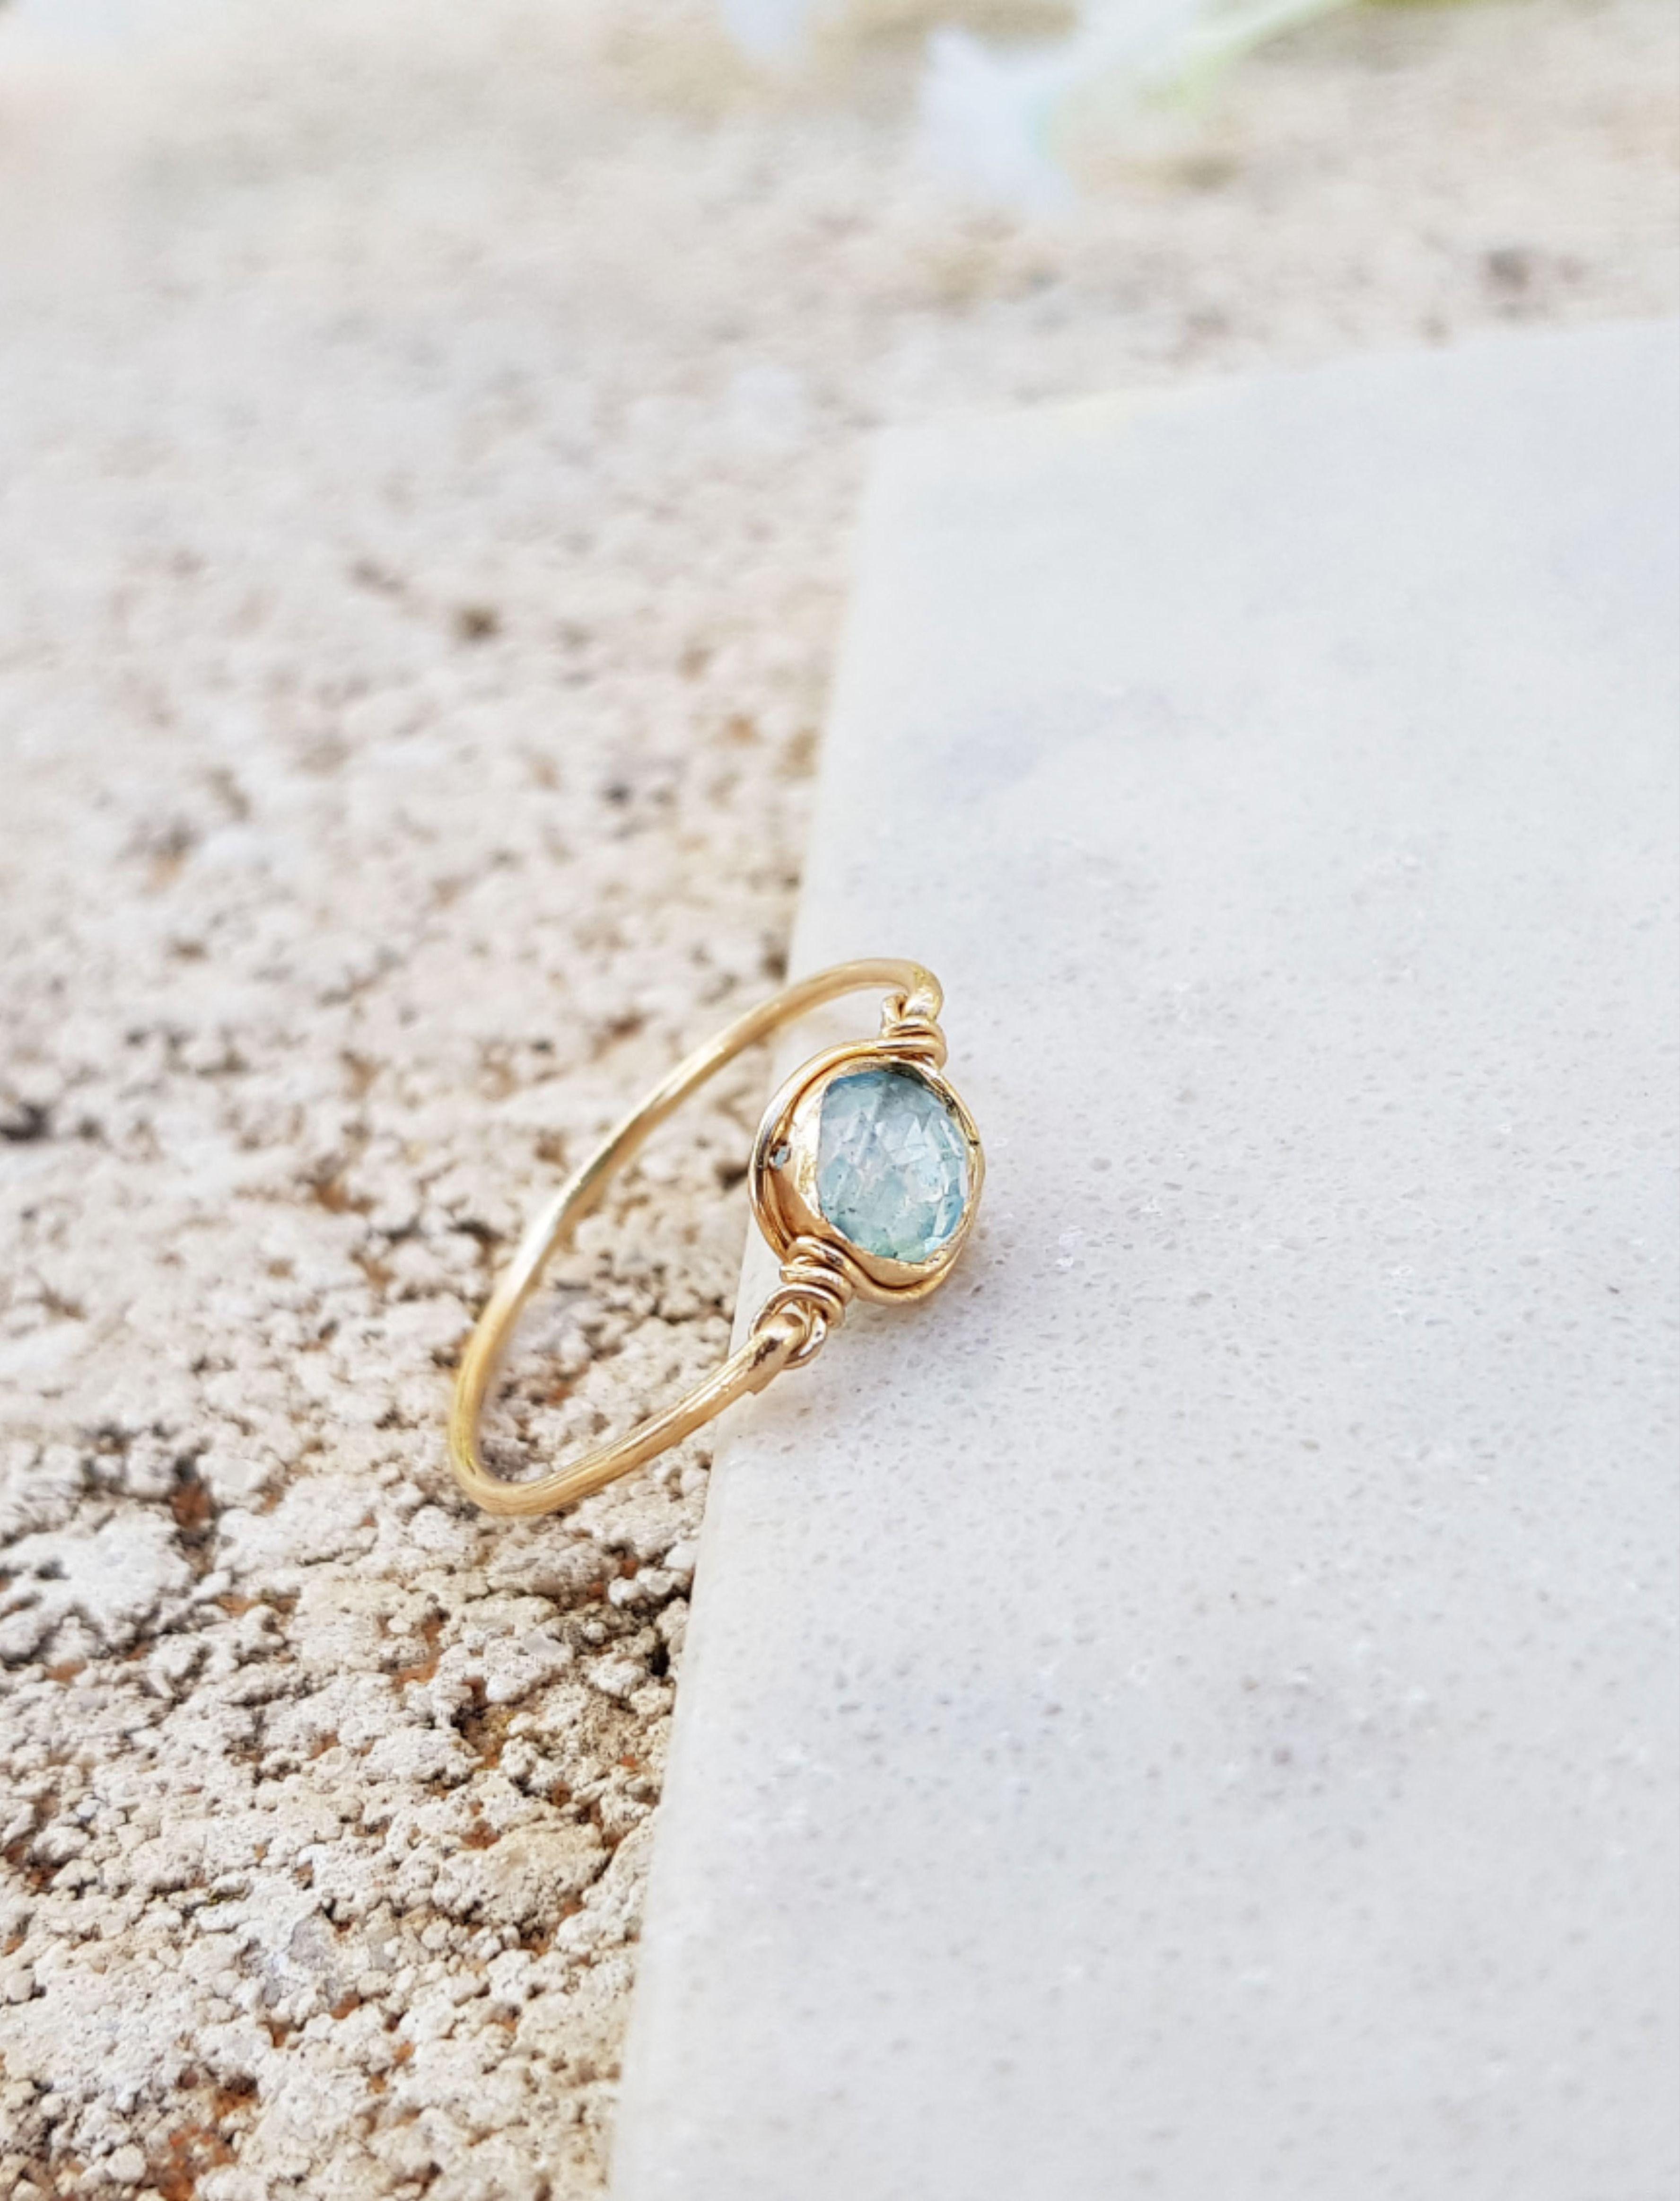 Women Ring Gemstone Ring Handmade Ring Gift For Her 925 Silver Ring Boho Ring Birthstone Ring Statement Ring Blue Topaz Ring